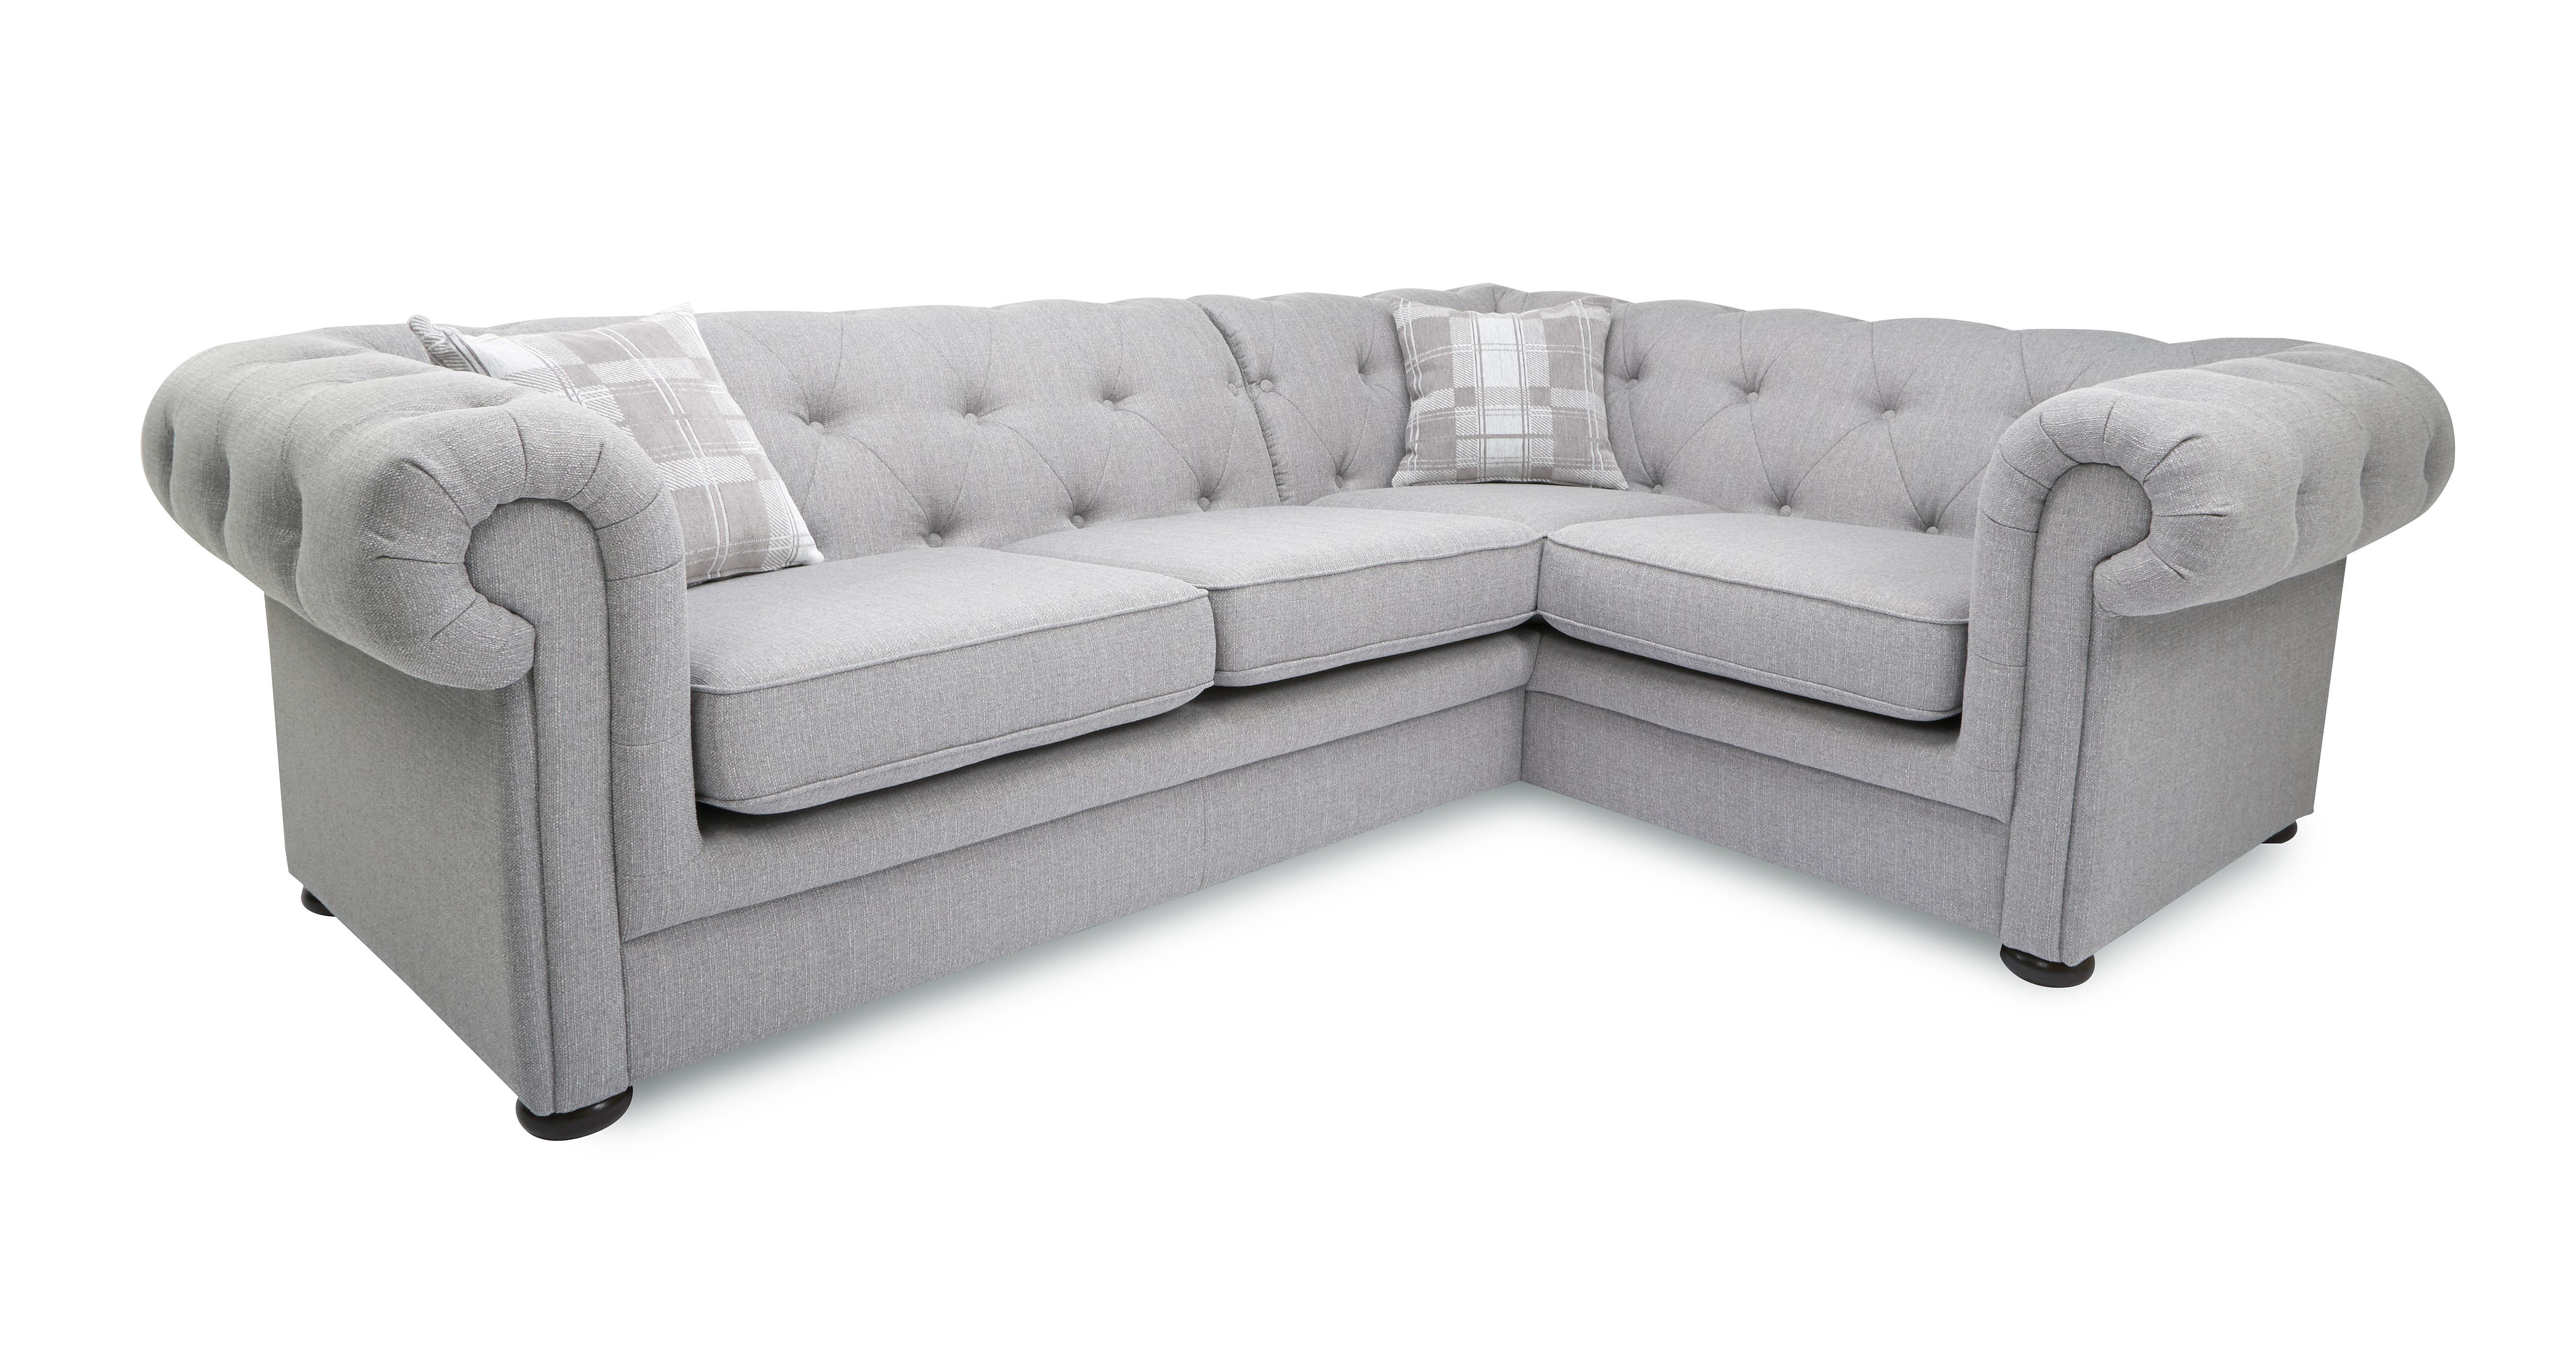 Marvelous White Leather Chesterfield Corner Sofa Home Sofa Lamtechconsult Wood Chair Design Ideas Lamtechconsultcom